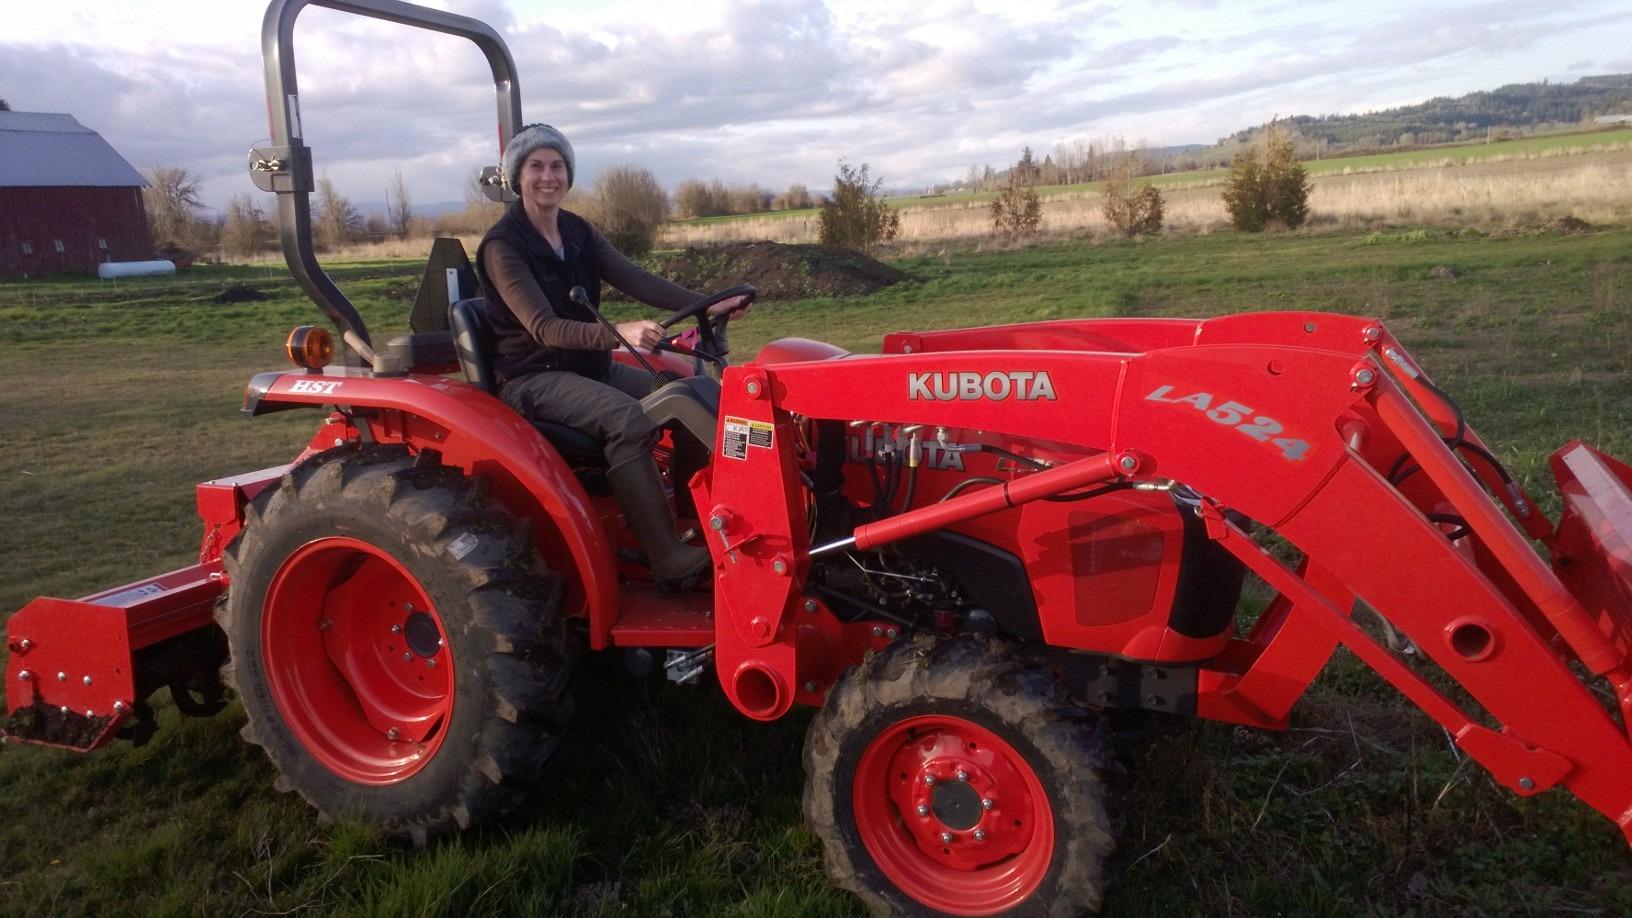 Kubota L3800 Compact Tractor LA524 Front Loader